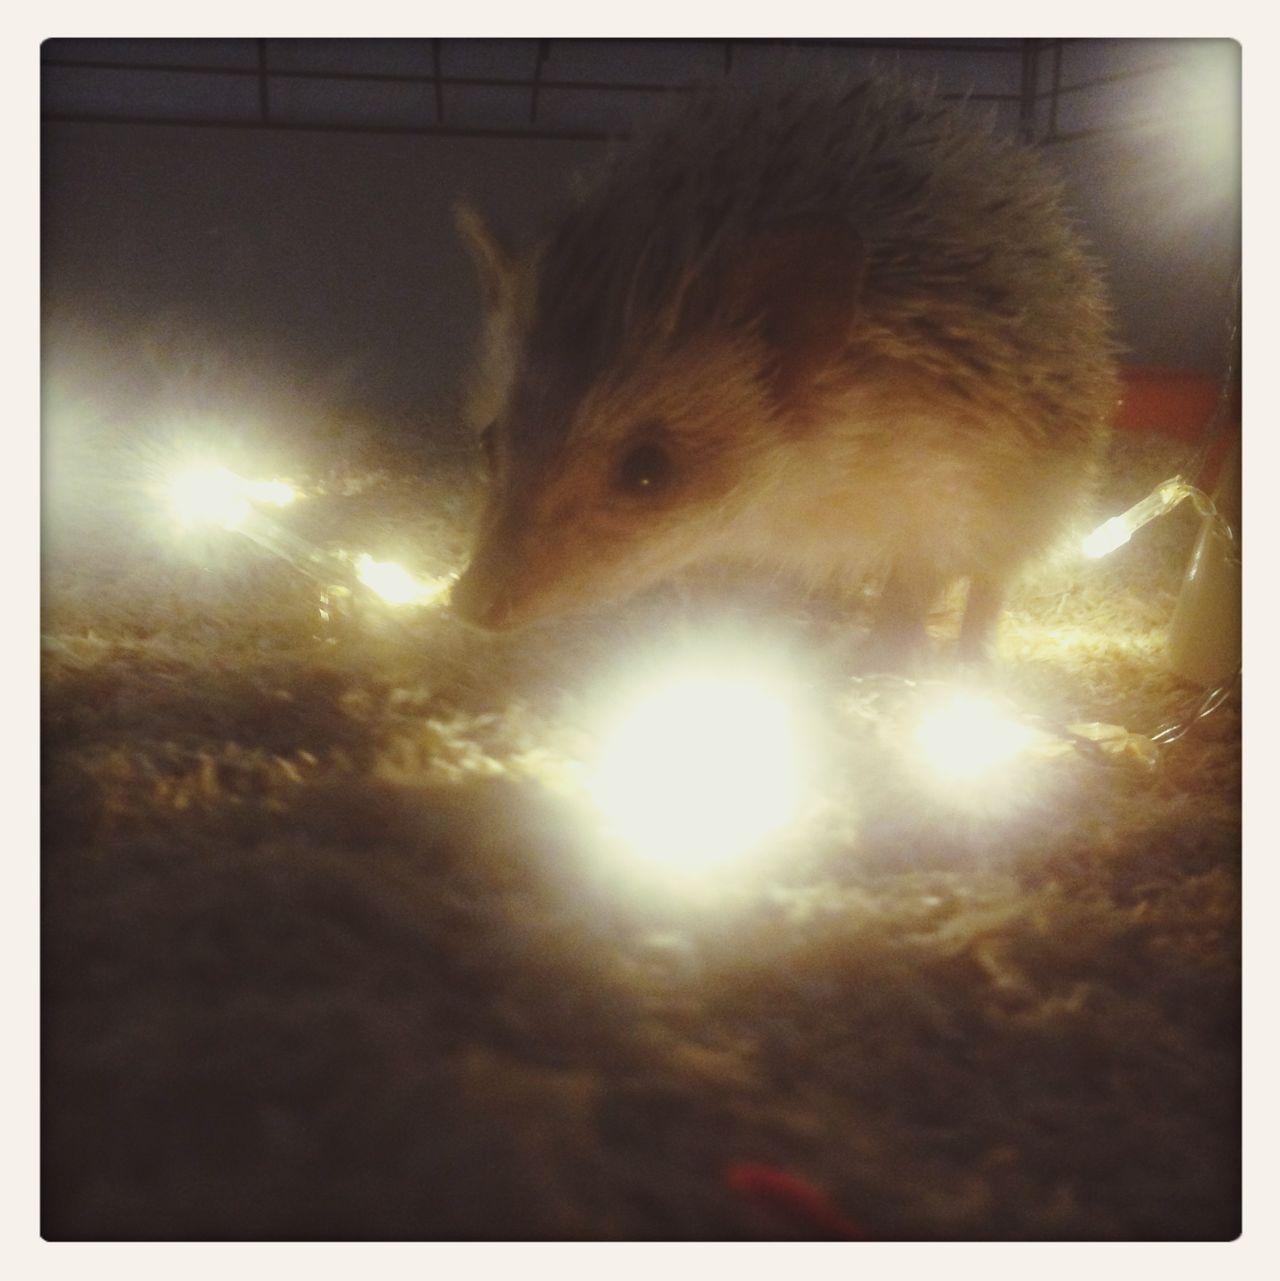 My little Eeek Hedgehog <3